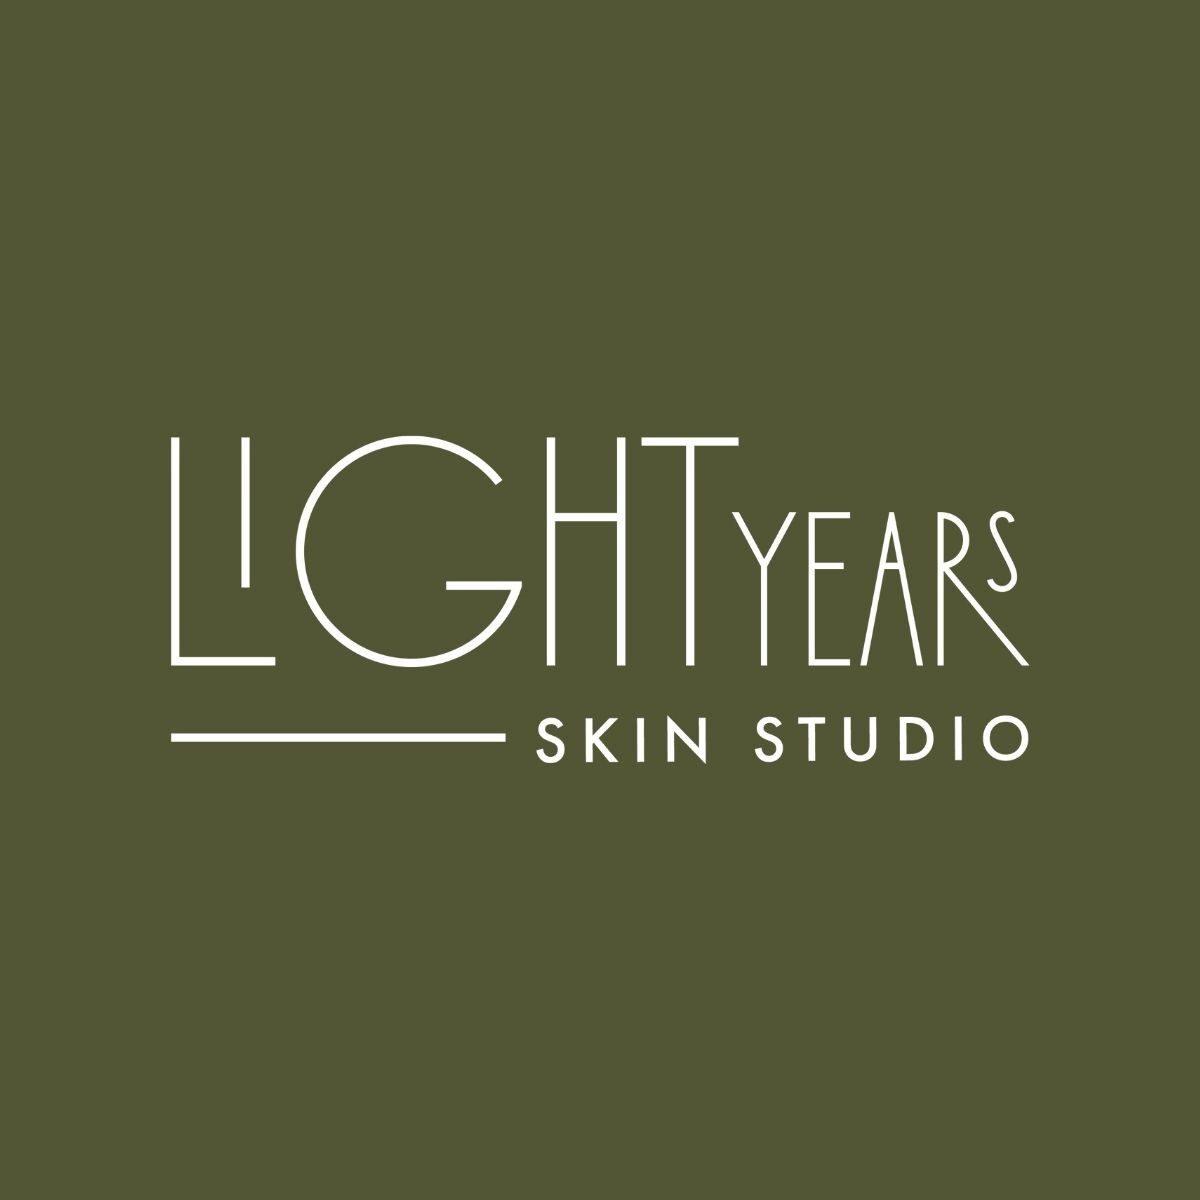 Light Years Web Logo